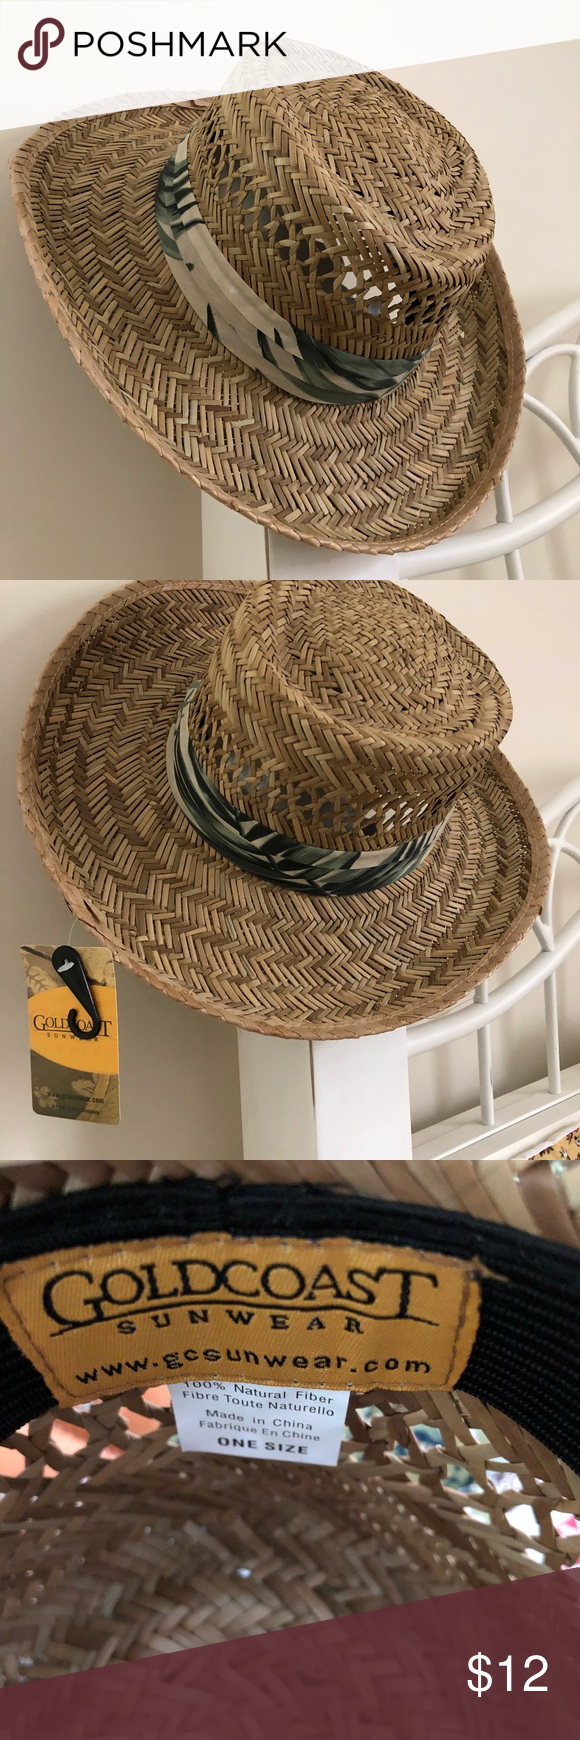 "5fb59338ed741 Unisex Goldcoast Sunwear Straw Hat Gold Coast Sunwear Straw Hat print band  3.5"" brim One size Elastic stretch NWT Natural color Goldcoast Sunwear ..."